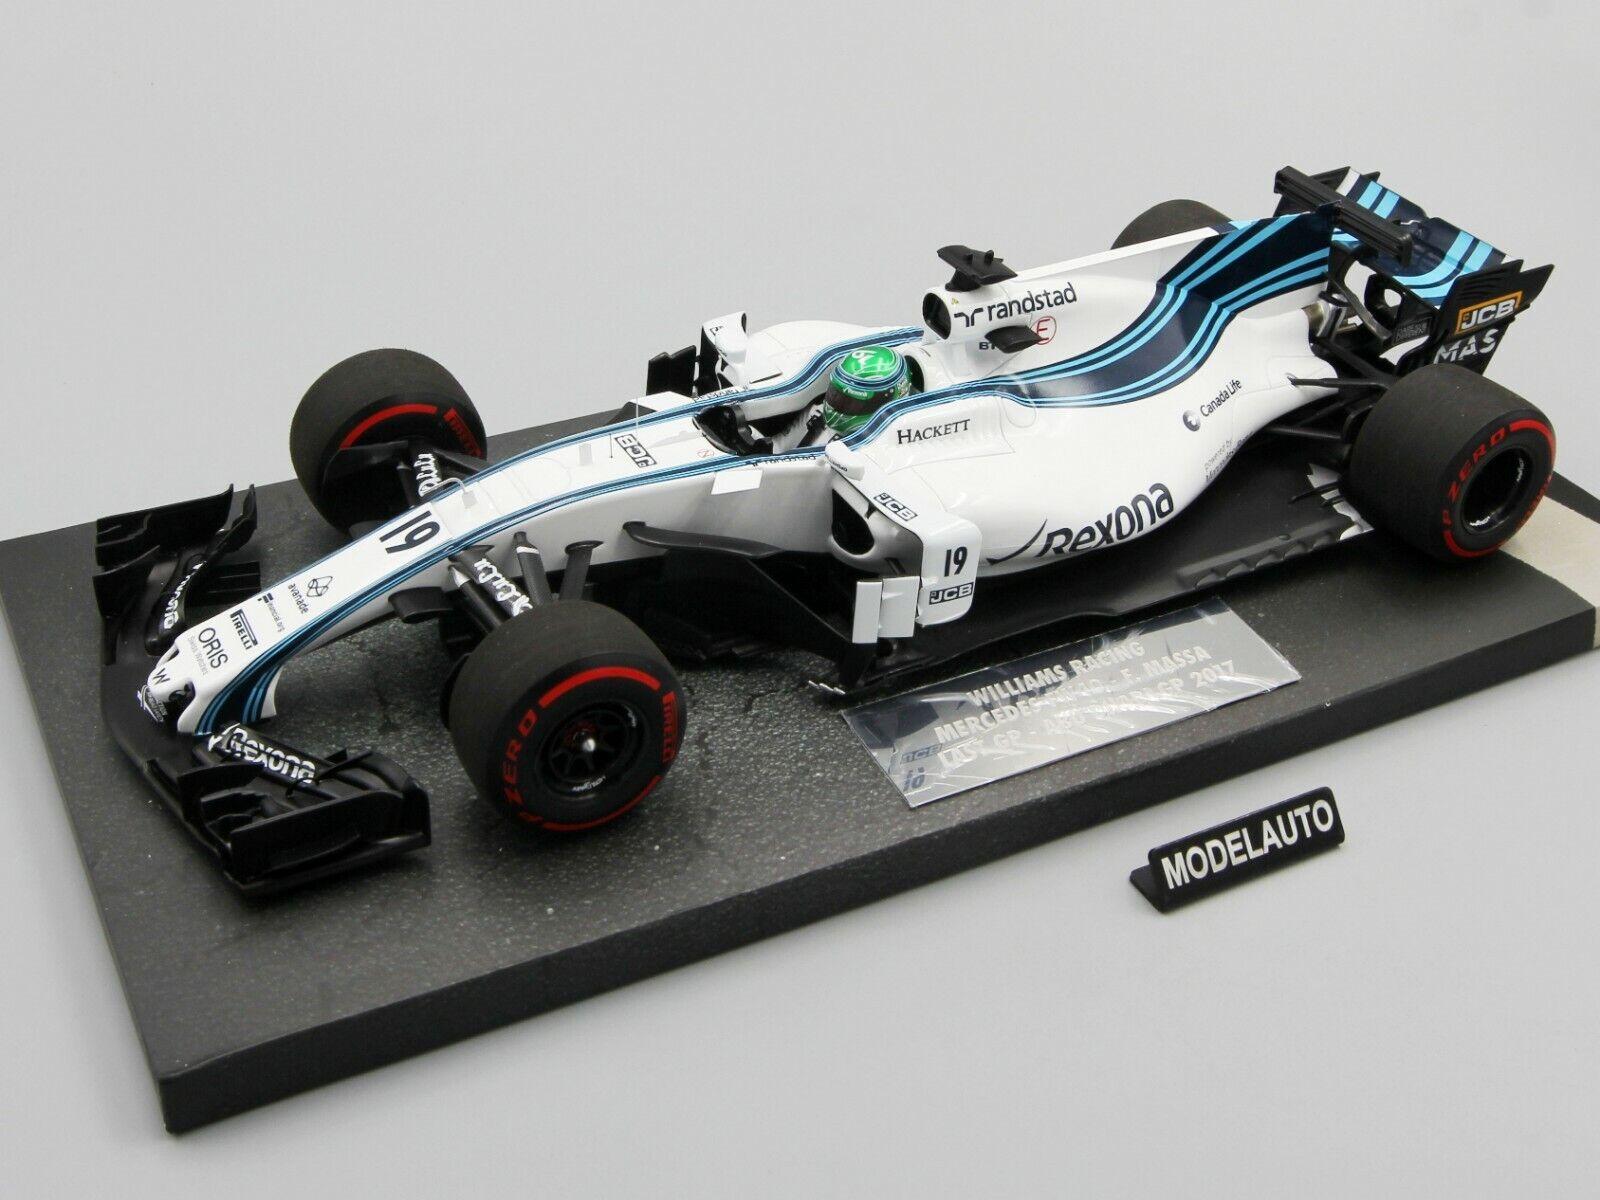 Minichamps 1 18 Williams Martini Racing Mercedes F. Massa Abu Dabi dernier grand prix 2017